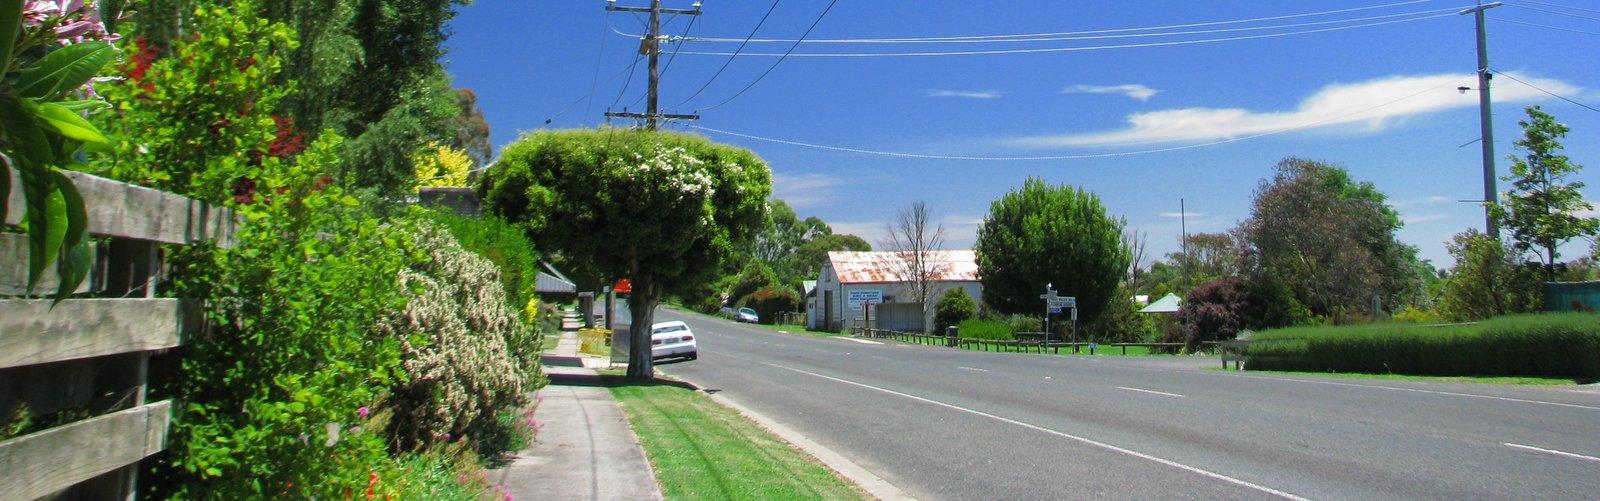 Bena Township